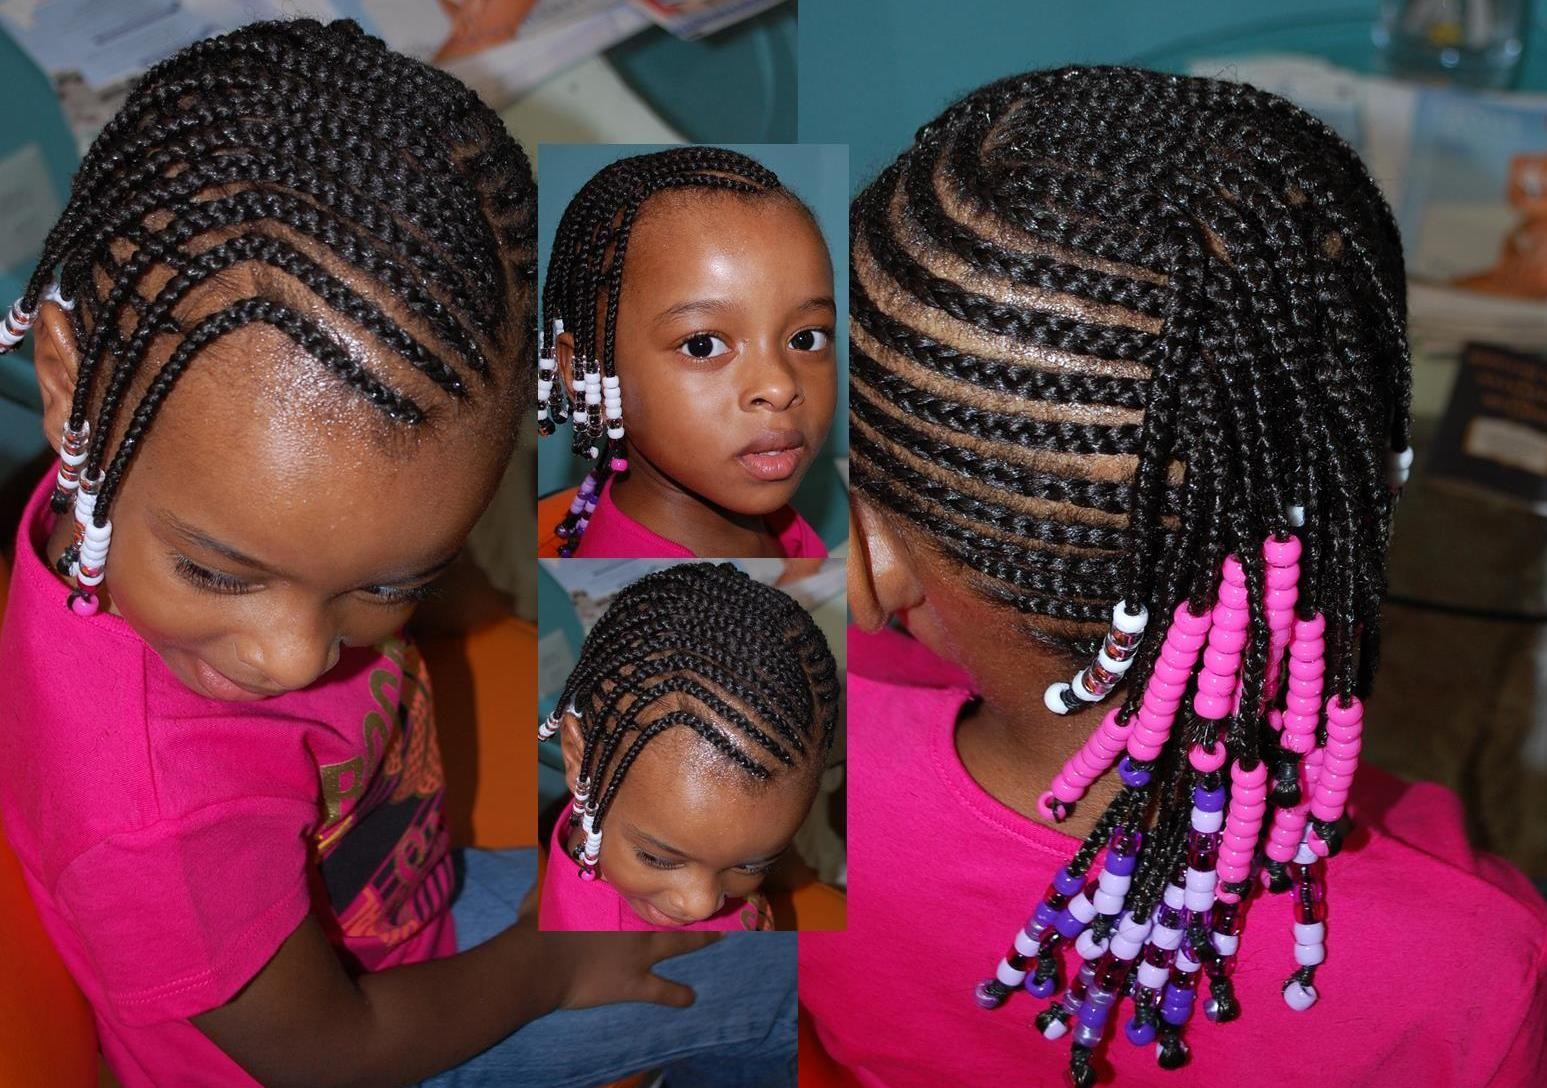 Hair Braiding Styles For Kids: #Braids BY SIMONE, #Kids Hair Braids, #Cute Hair Styles